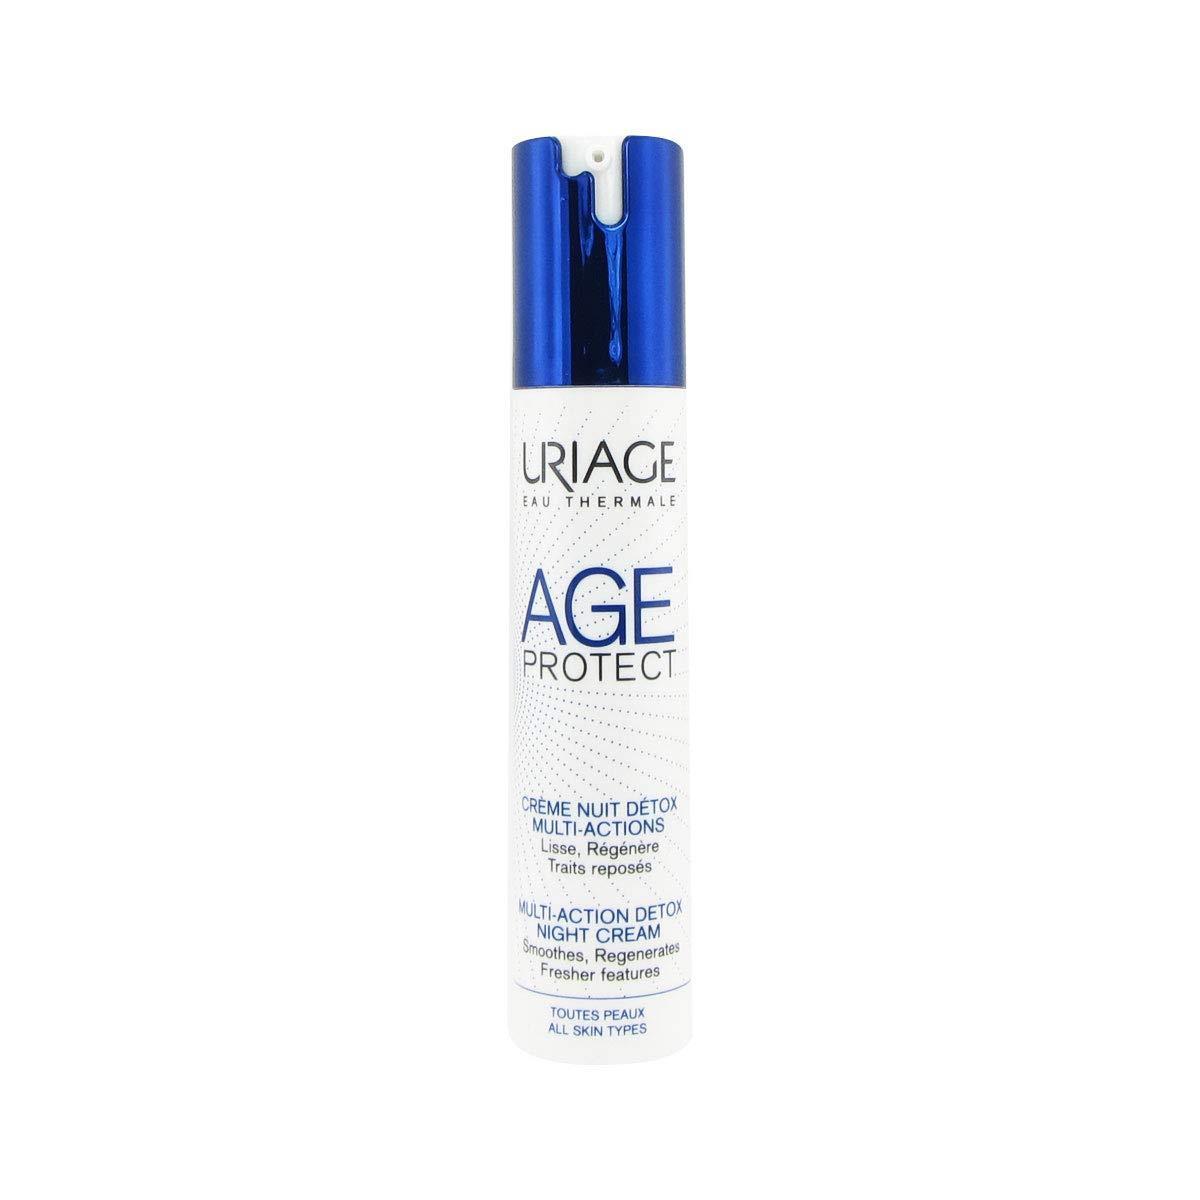 Age Protect Crema Detox 40 Ml